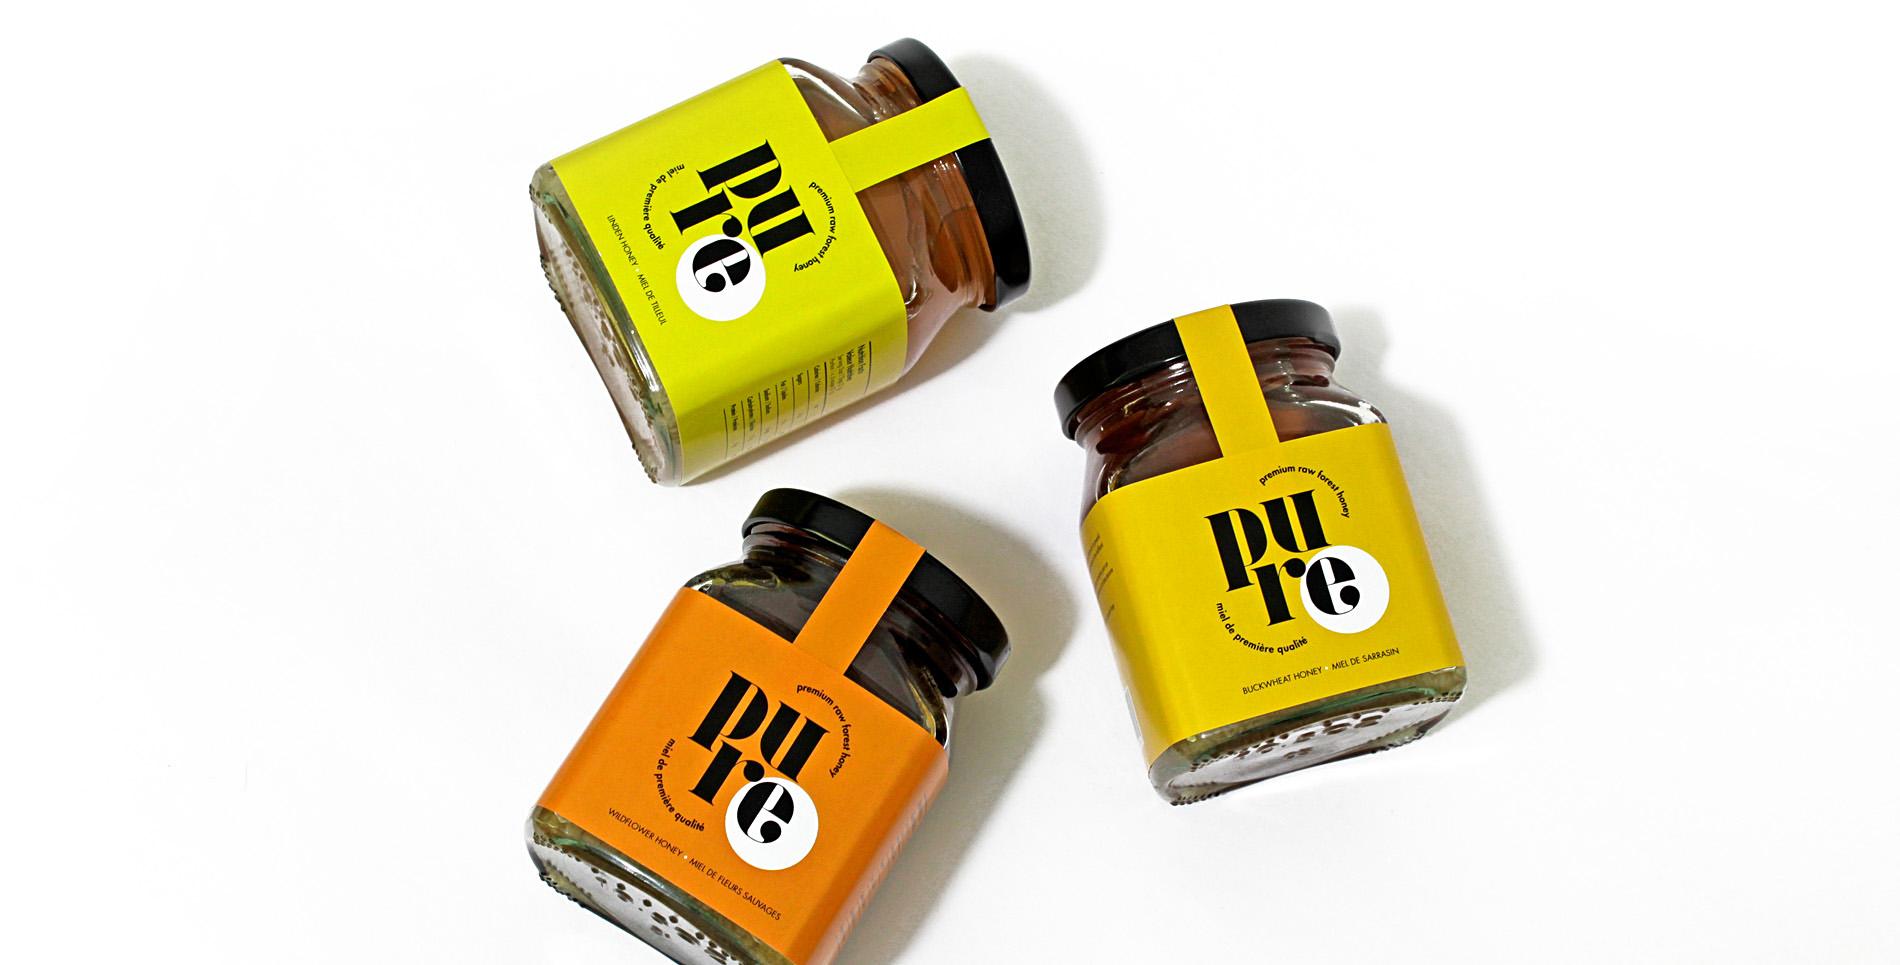 Pure honey bottles birds-eye view